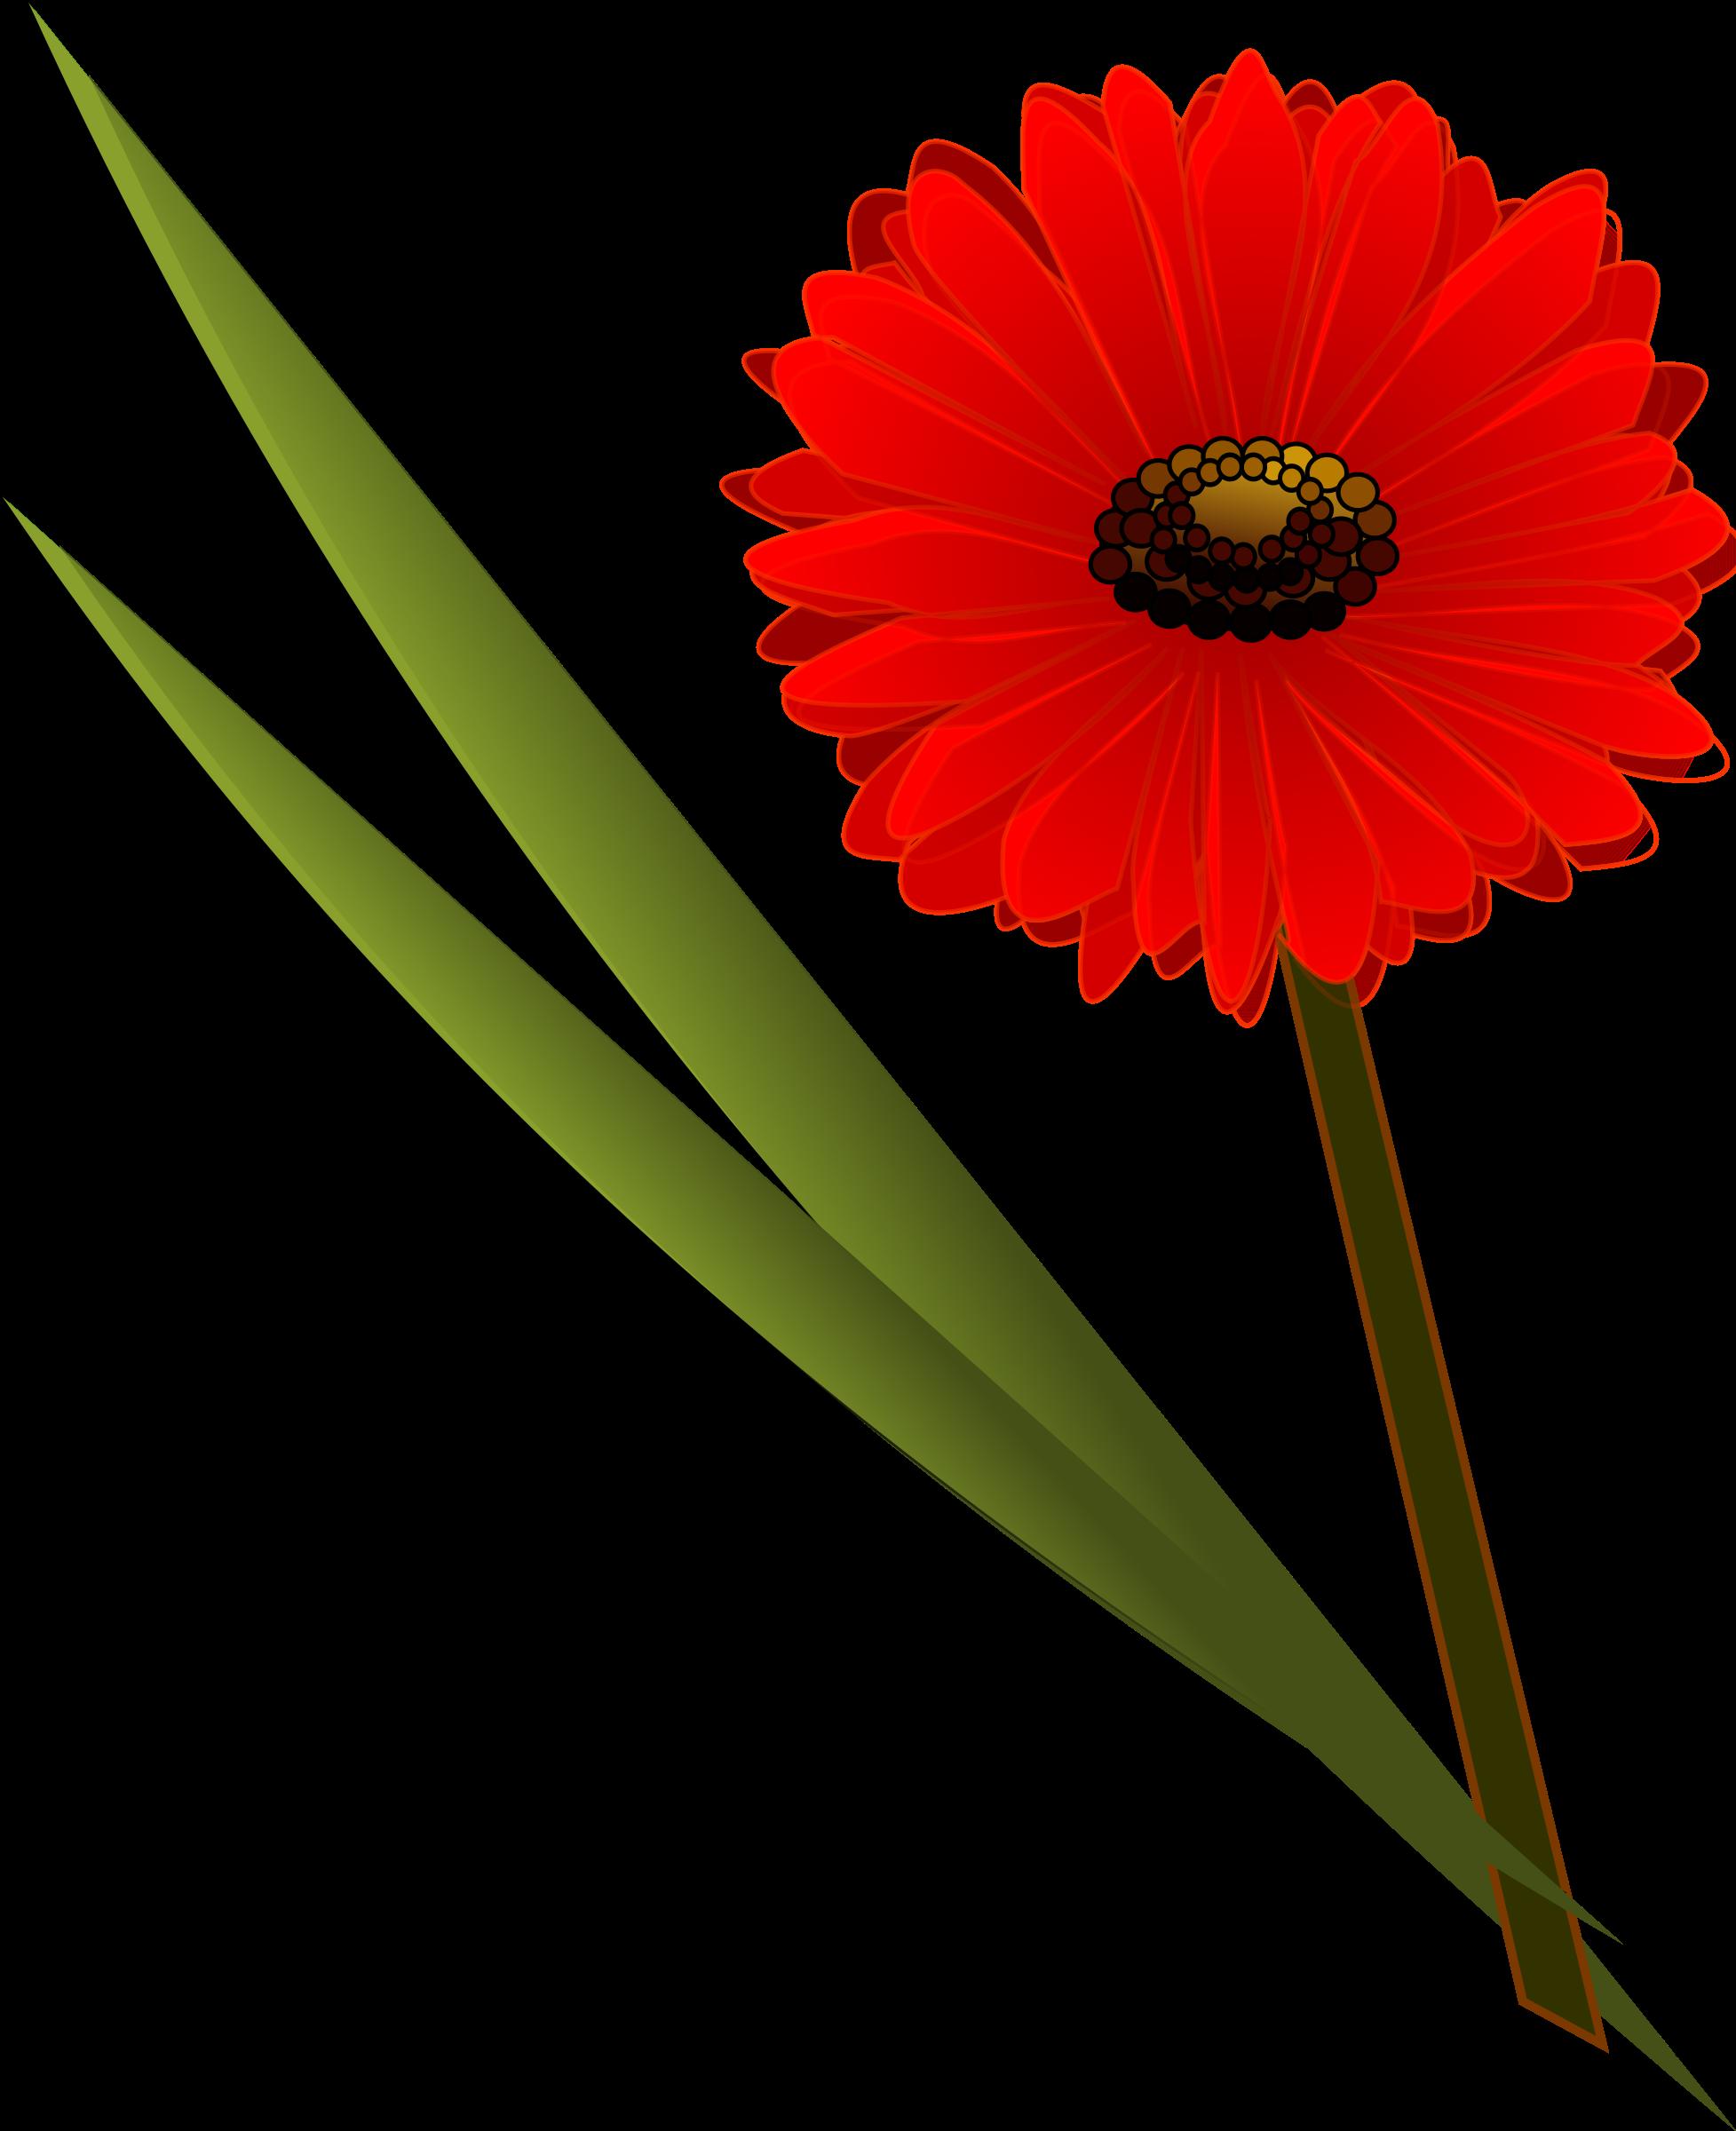 Flowers big image png. Mayflower clipart gerbera flower